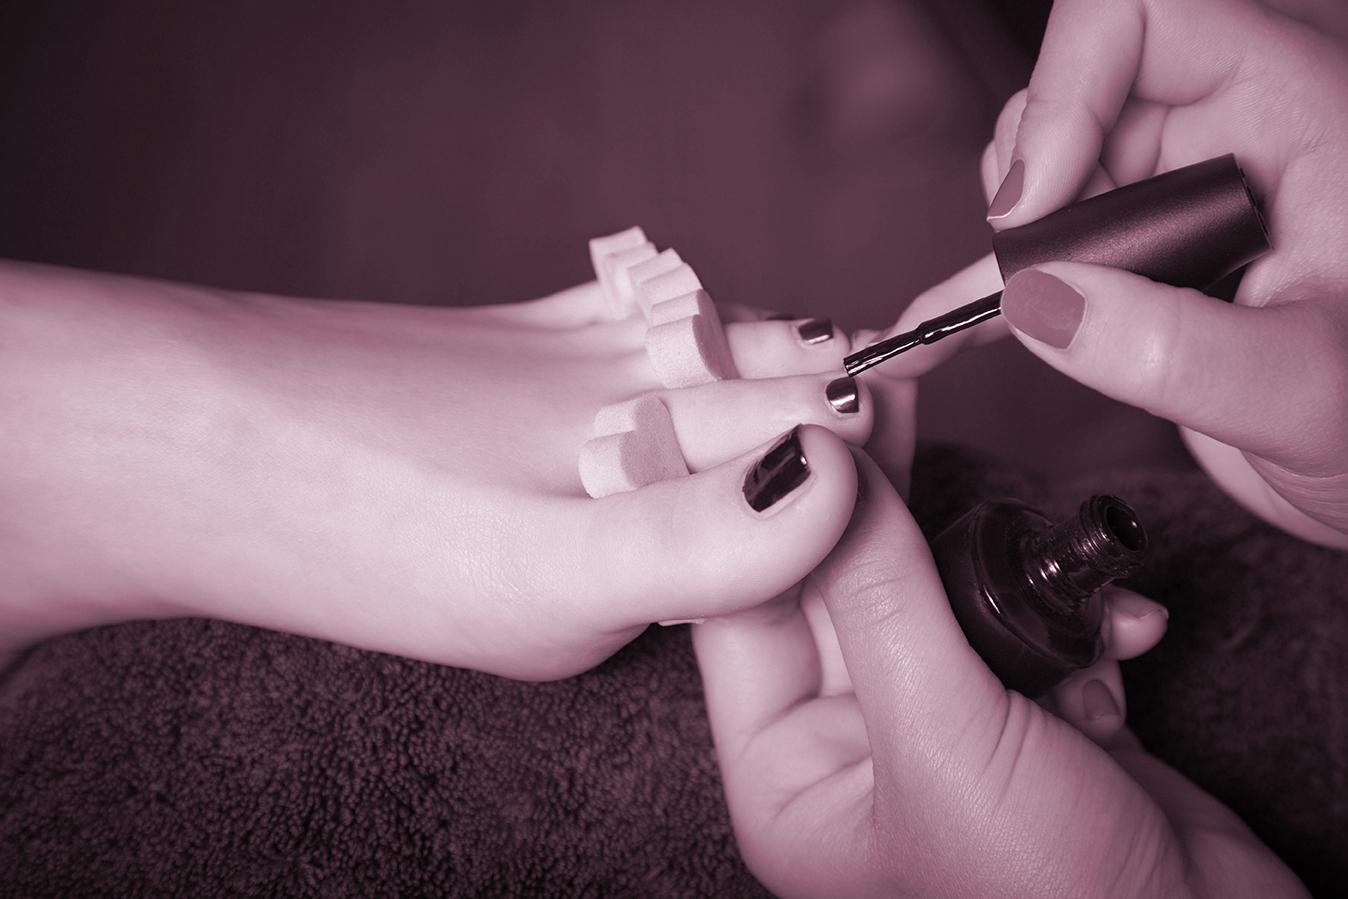 pedicura, servicios peluquería margot